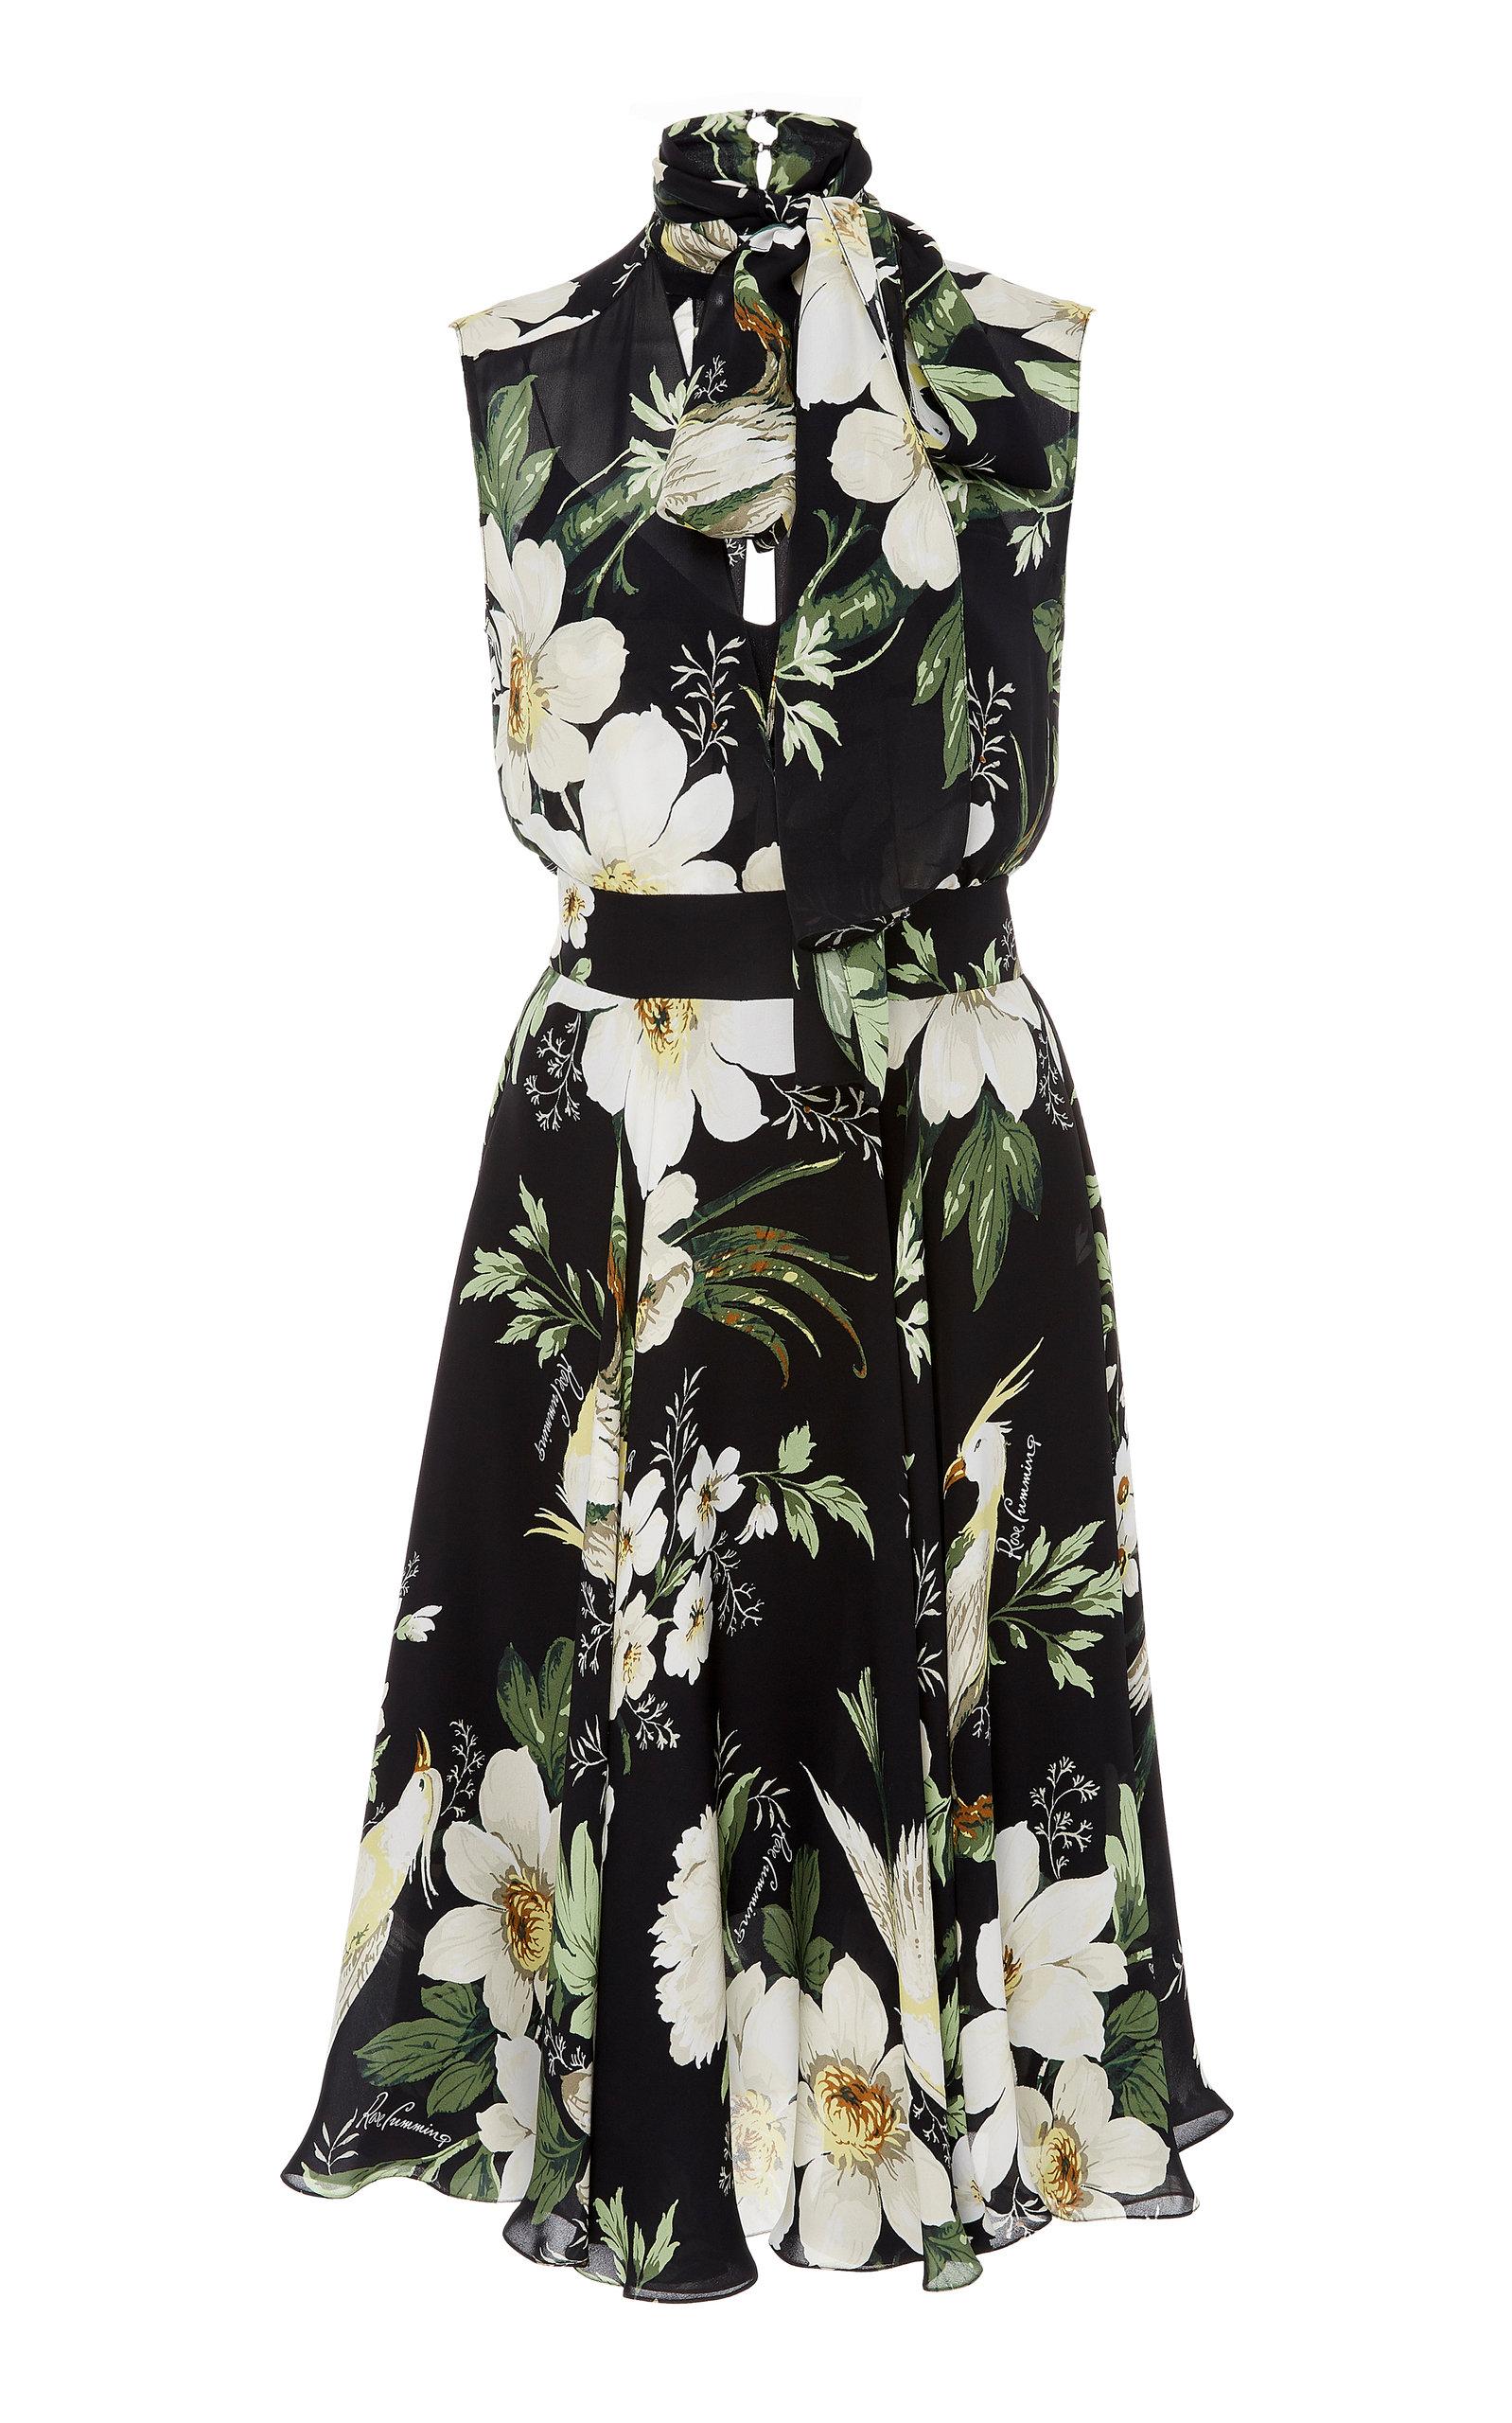 b818d912 Carolina HerreraMidnight Garden Tie-Neck Floral-Print Silk-Chiffon Dress